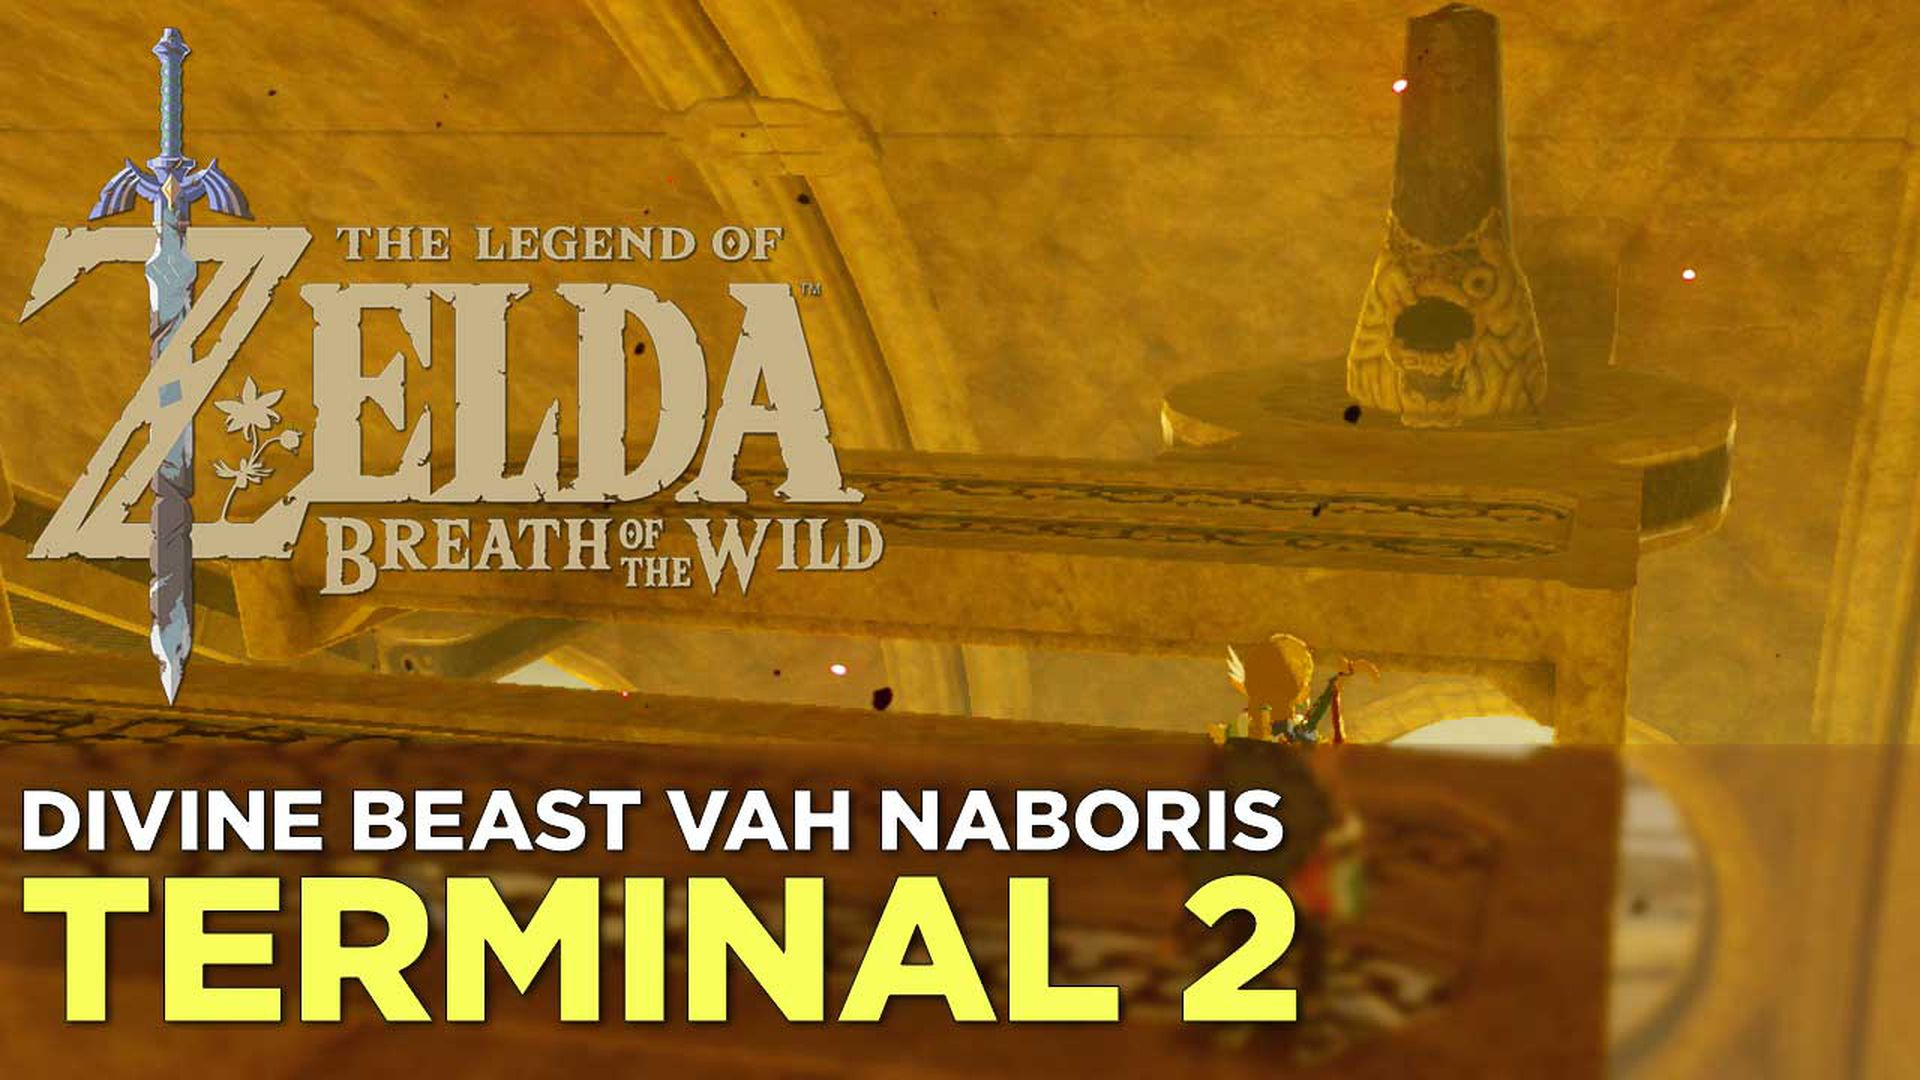 The Legend Of Zelda Breath Of The Wild Divine Beast Vah Naboris Main Quest Guide And Walkthrough Polygon